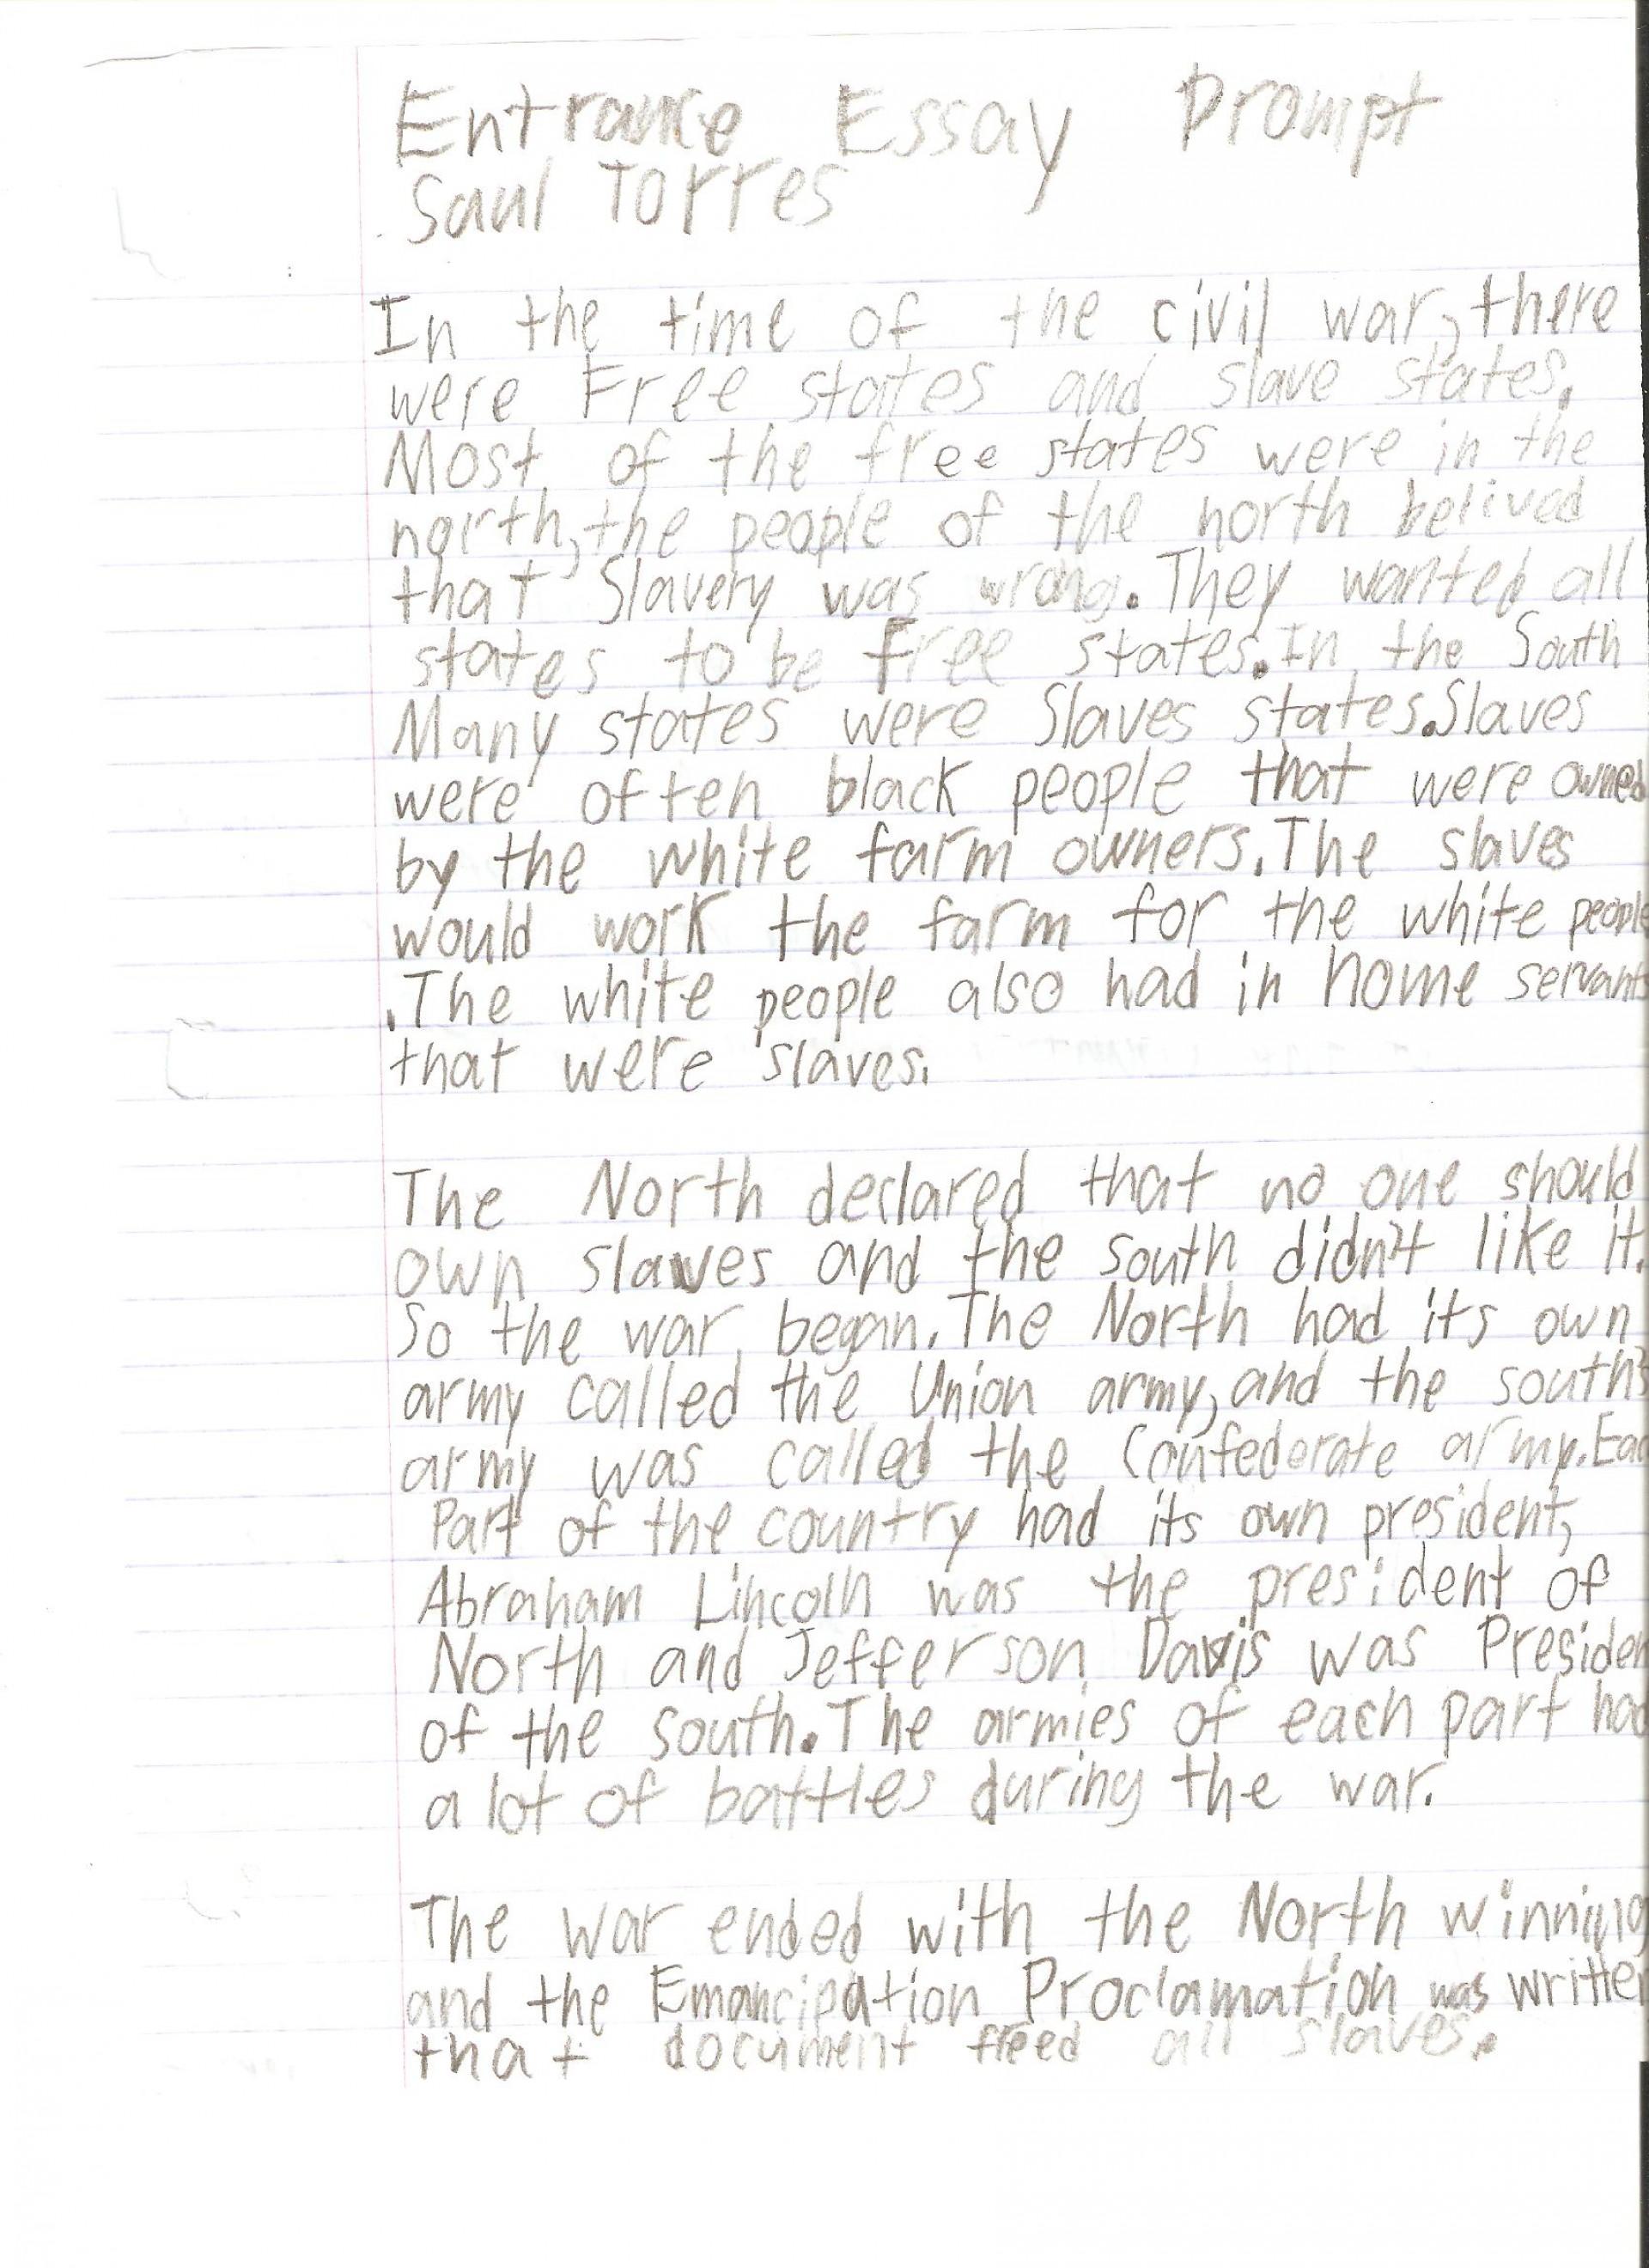 009 Saul Torres Essay Example 6th Grade Fantastic Examples Informative Personal 1920